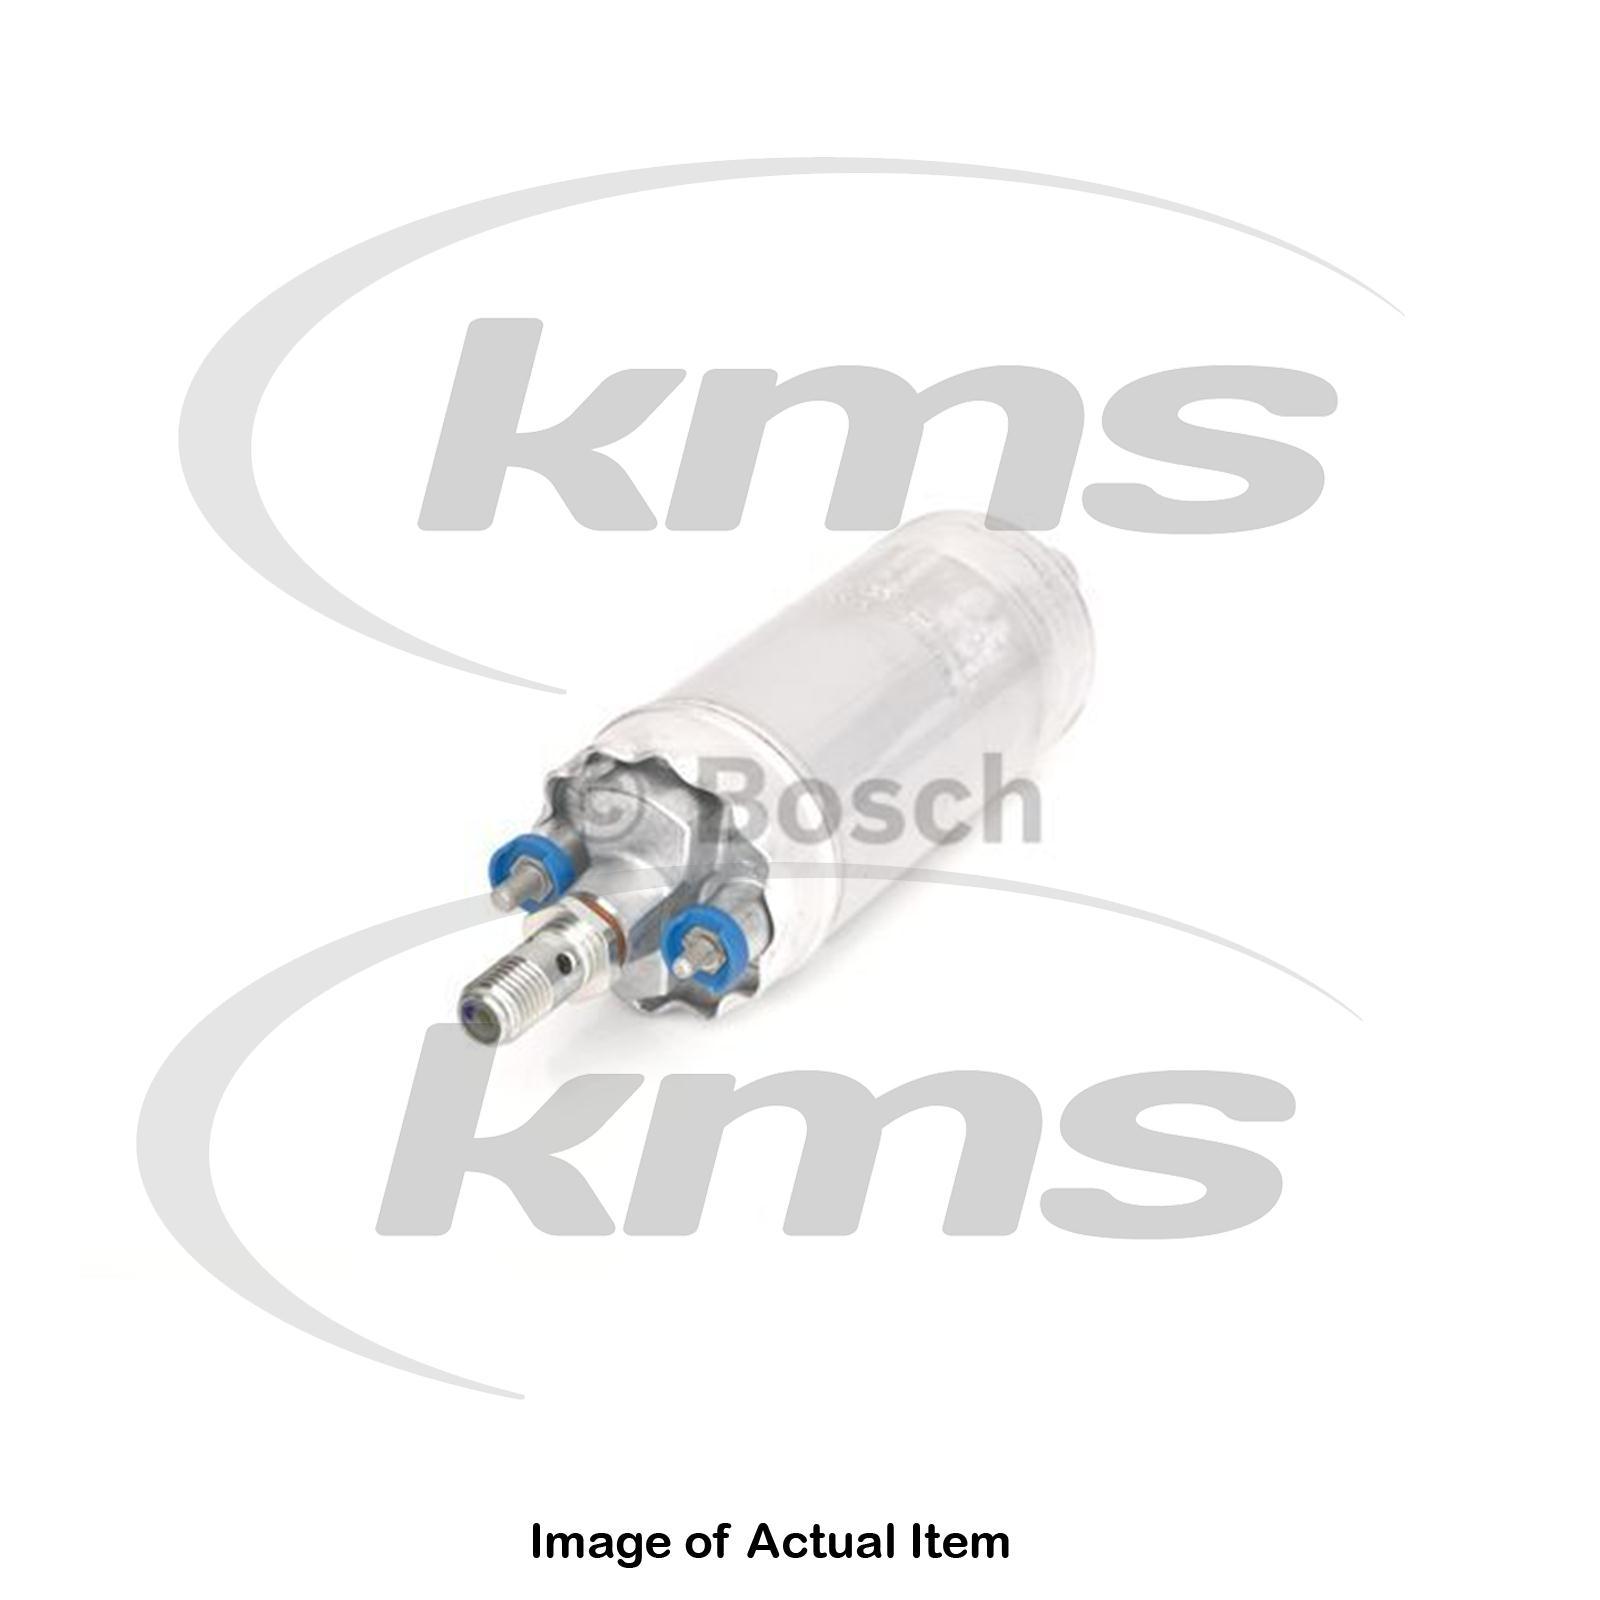 FLAMEER 32mm 34mm Pwk Oko Koso Vergaser-Ansaugkr/ümmer-Verbinder f/ür Yamaha(2erPack)